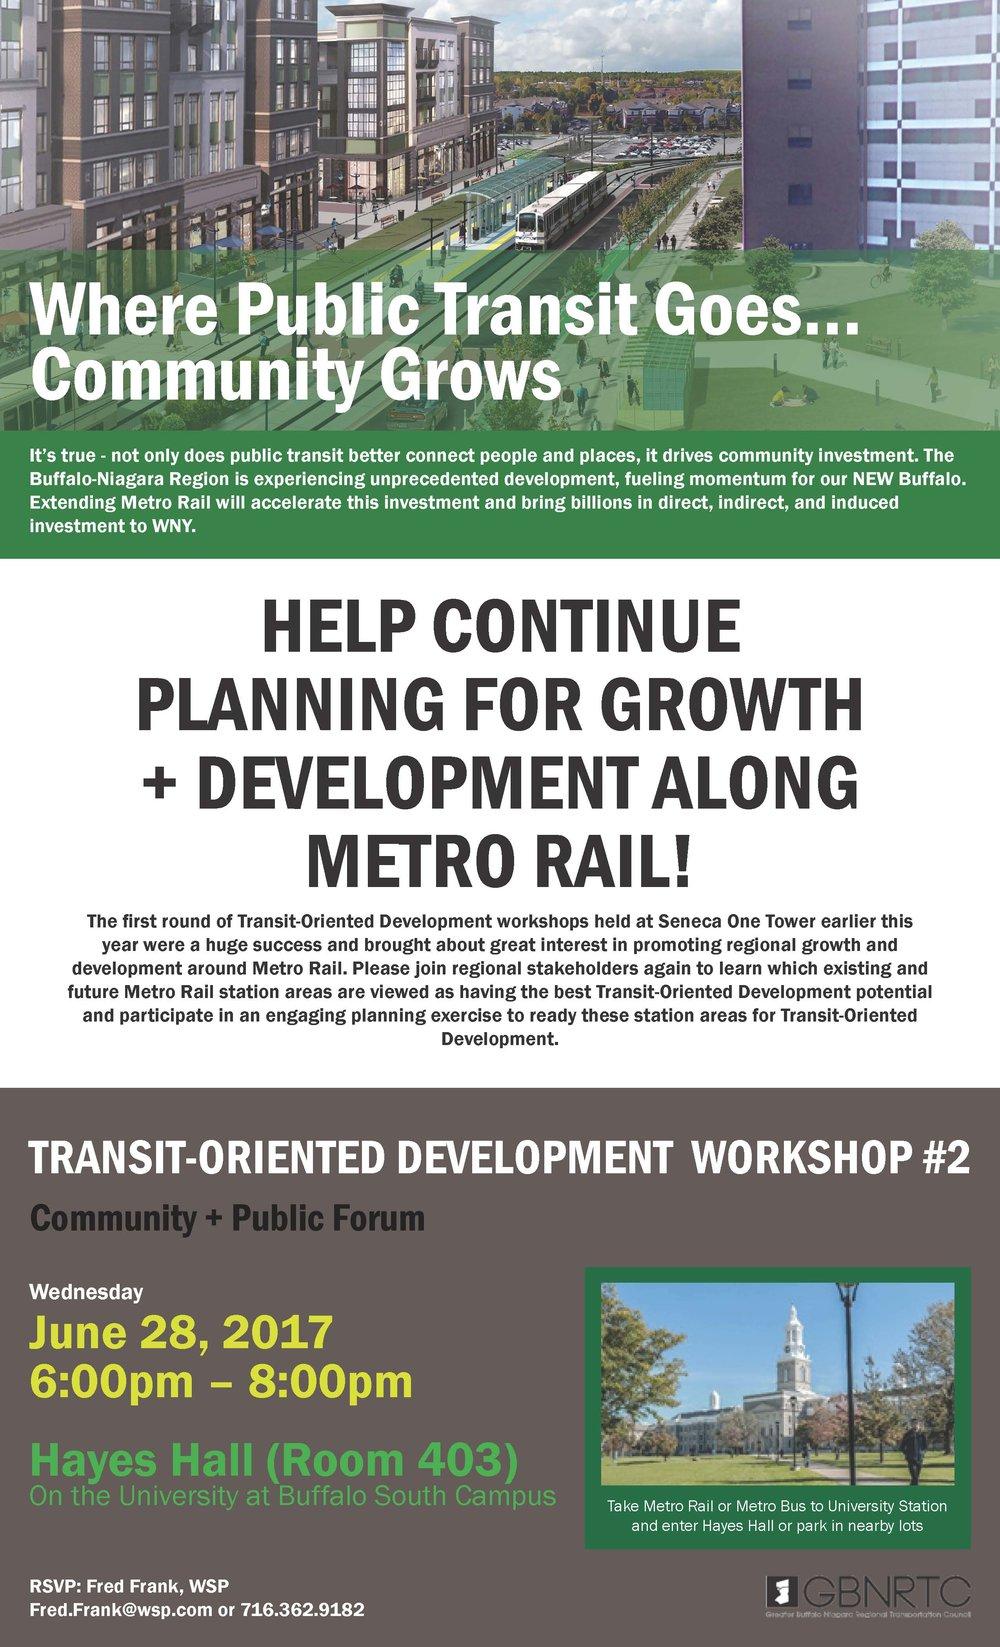 TRANSIT-ORIENTED DEVELOPMENT WORKSHOP - COMMUNITY GROUPS AND PUBLIC SESSION